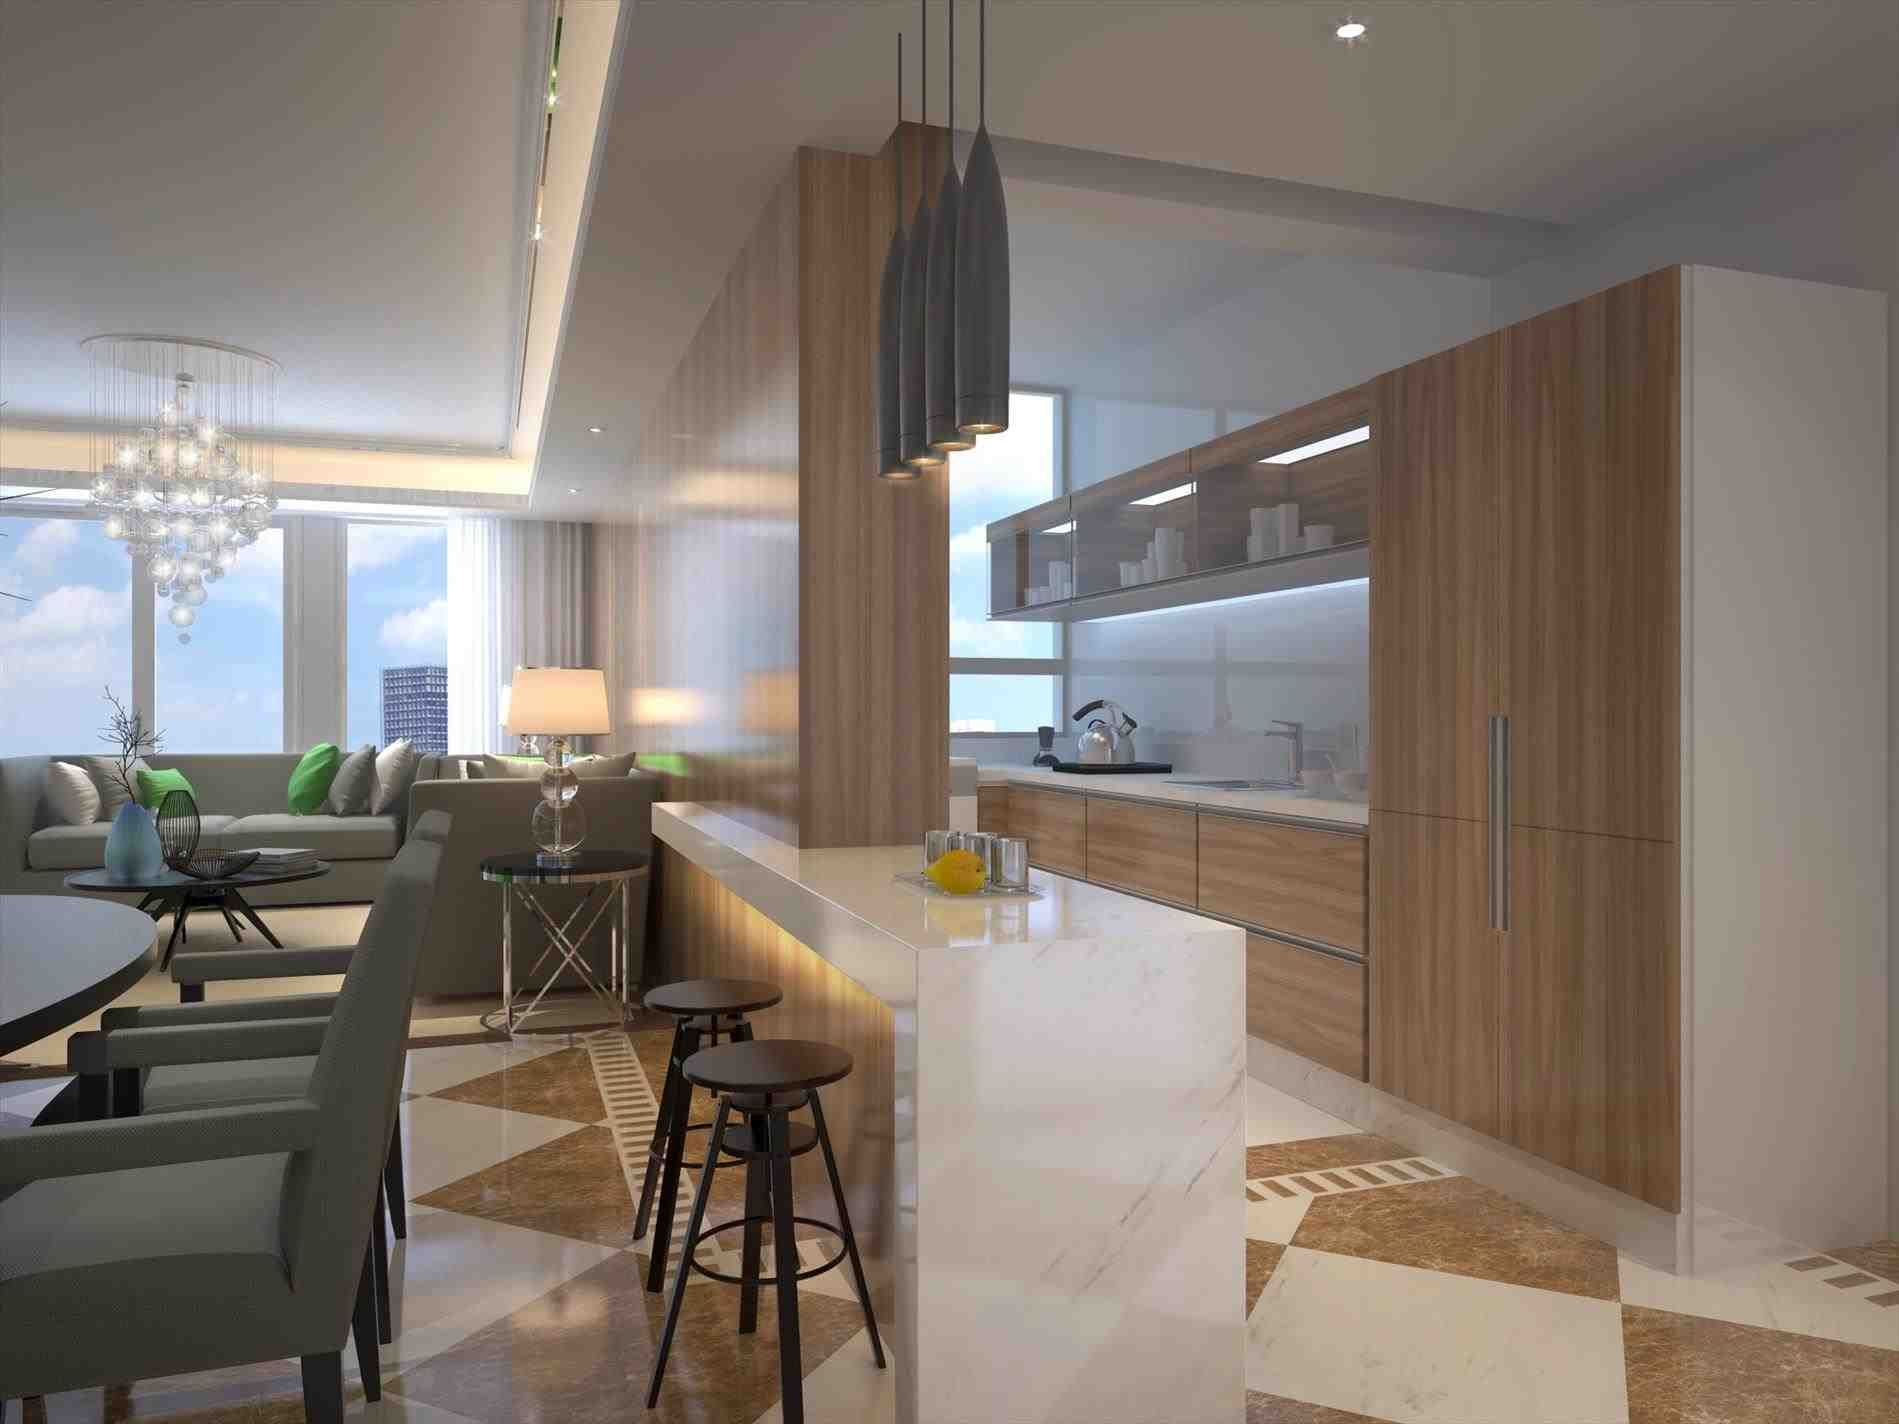 New Post mini bar designs for living room | Decors Ideas | Pinterest ...